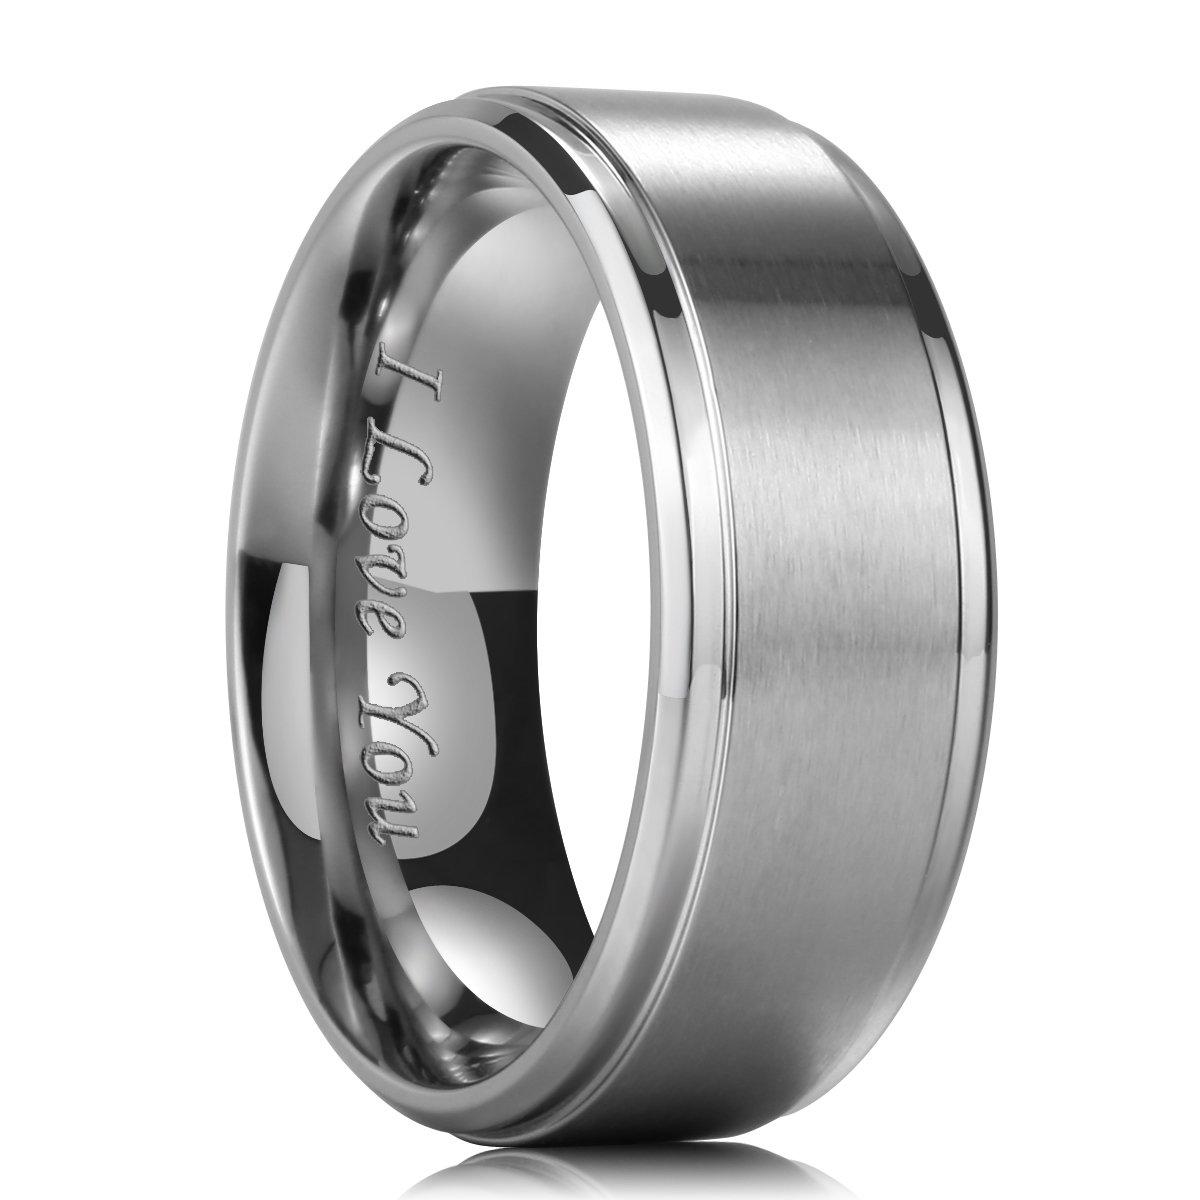 King Will BASIC 9mm Titanium Wedding Ring Matte Finished Wedding Band I Love You Laser 7